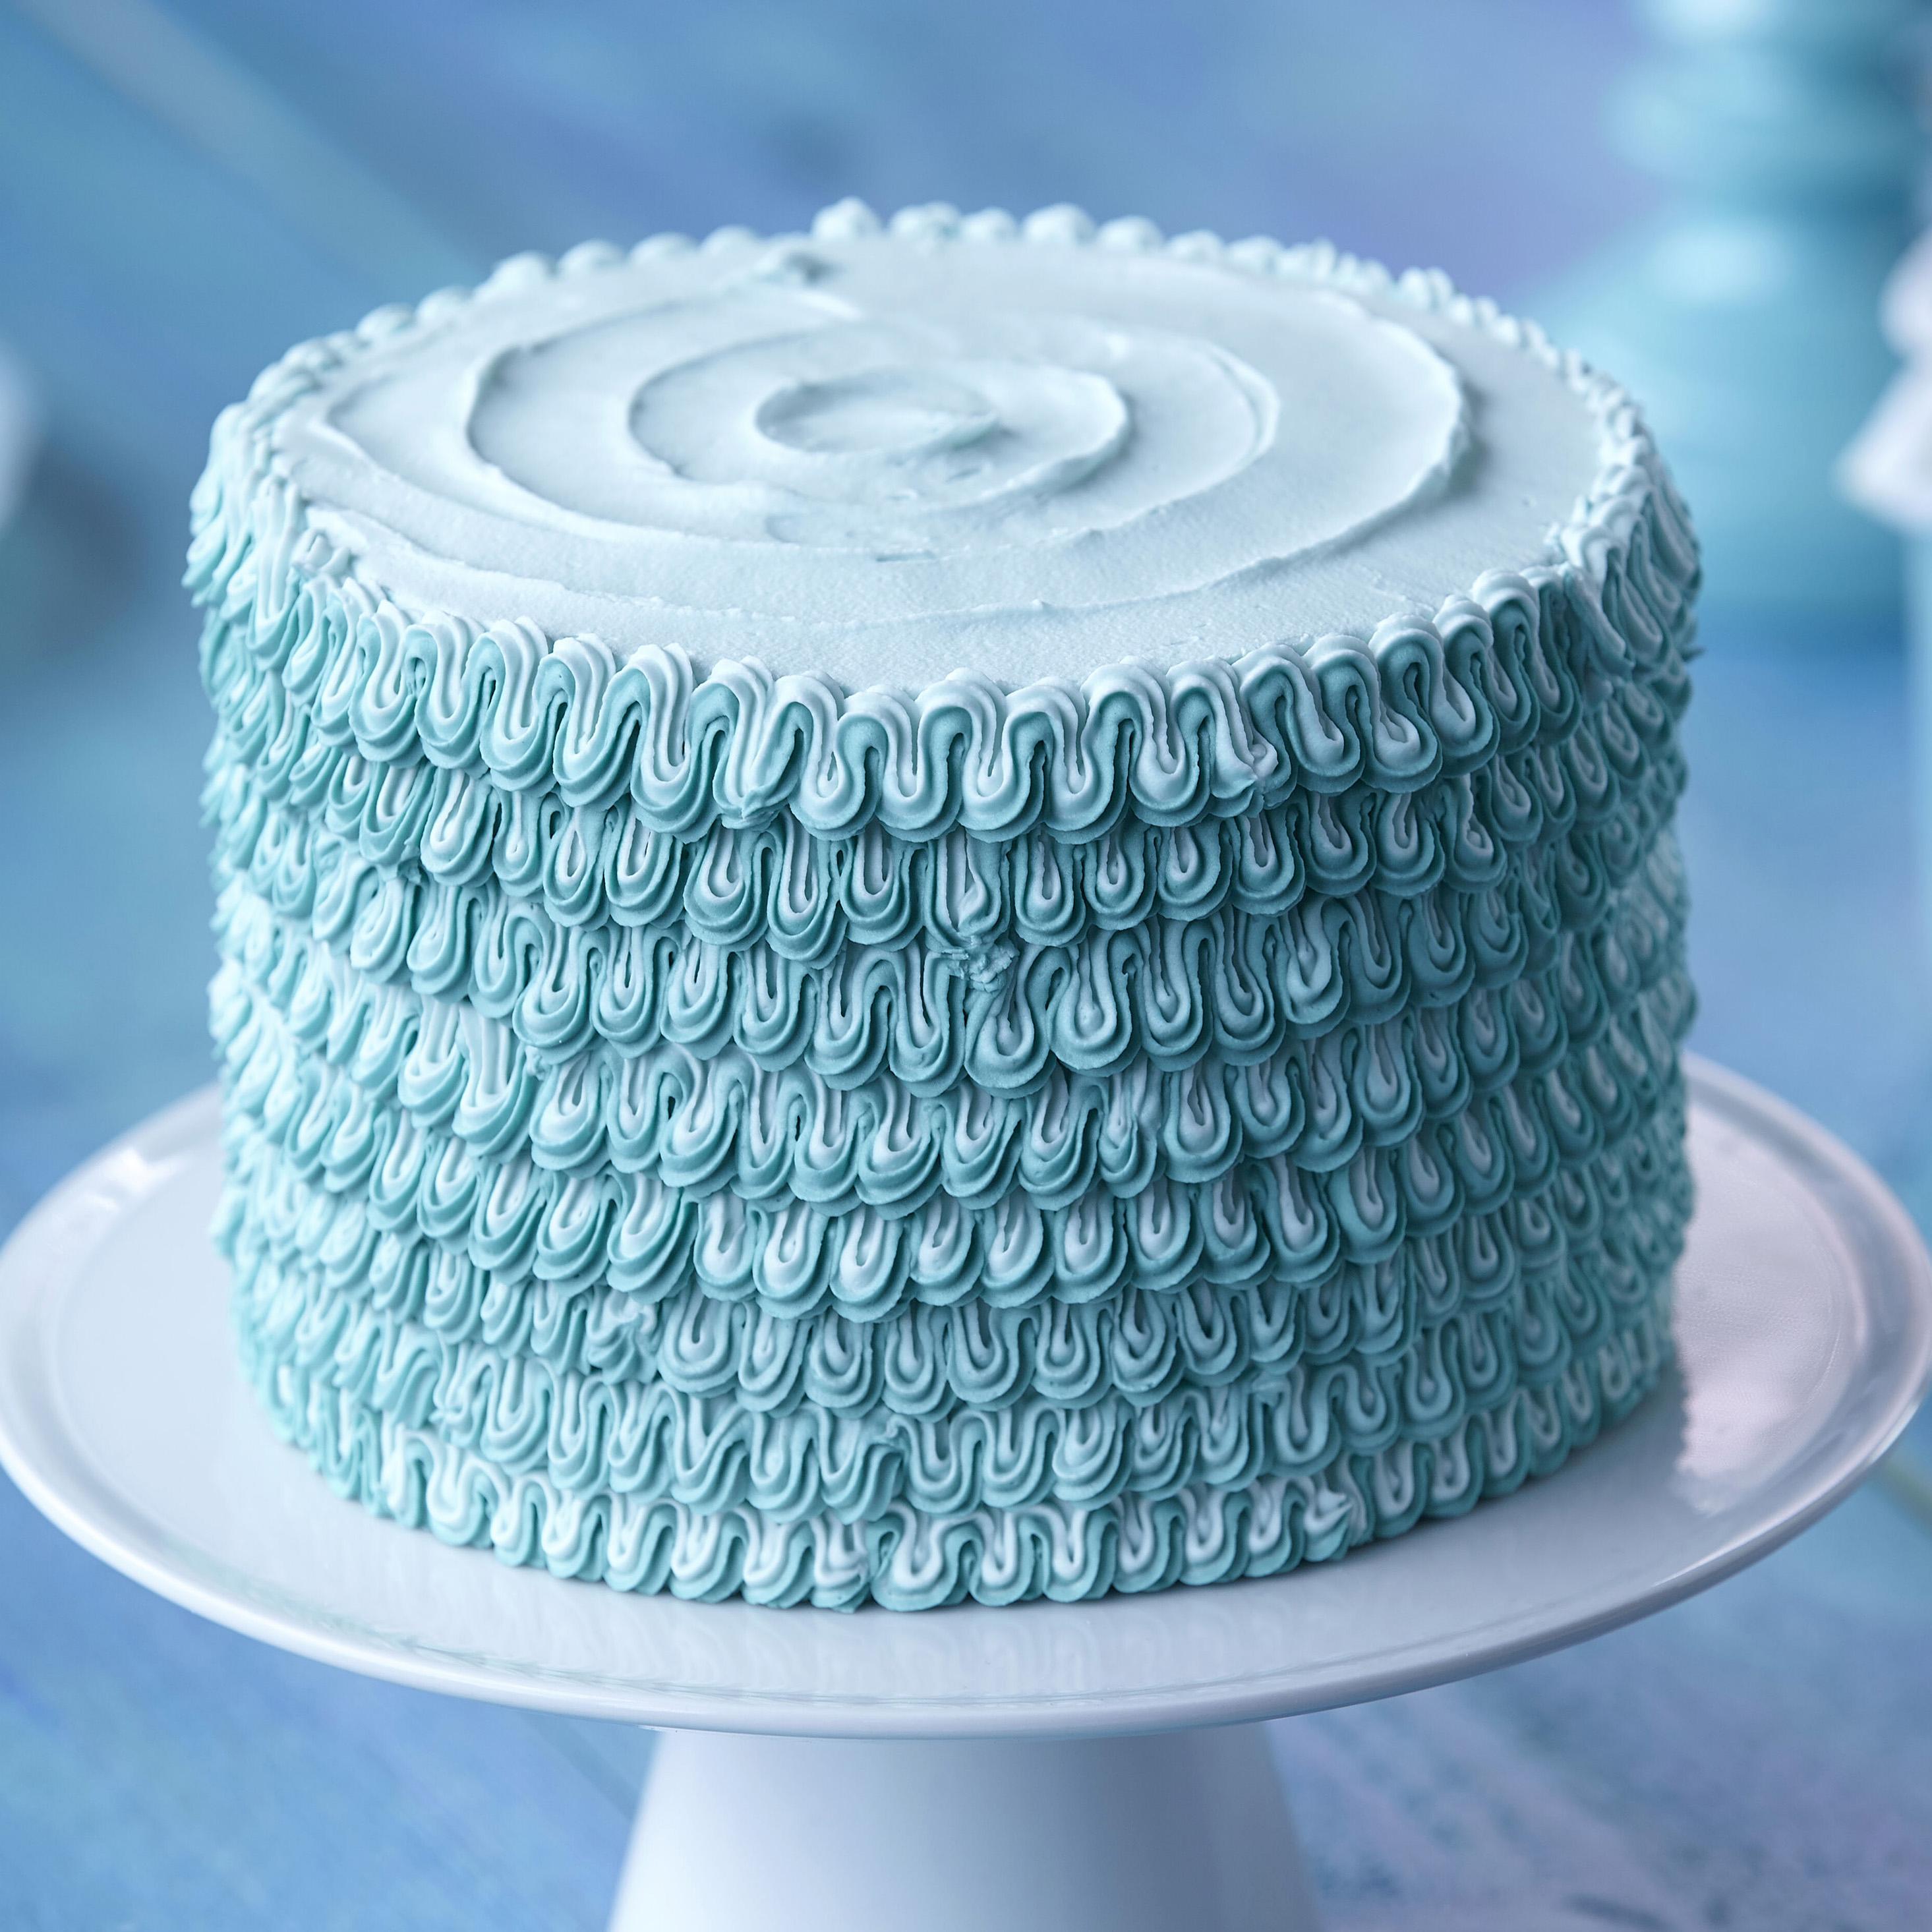 Cake Decorating Courses York